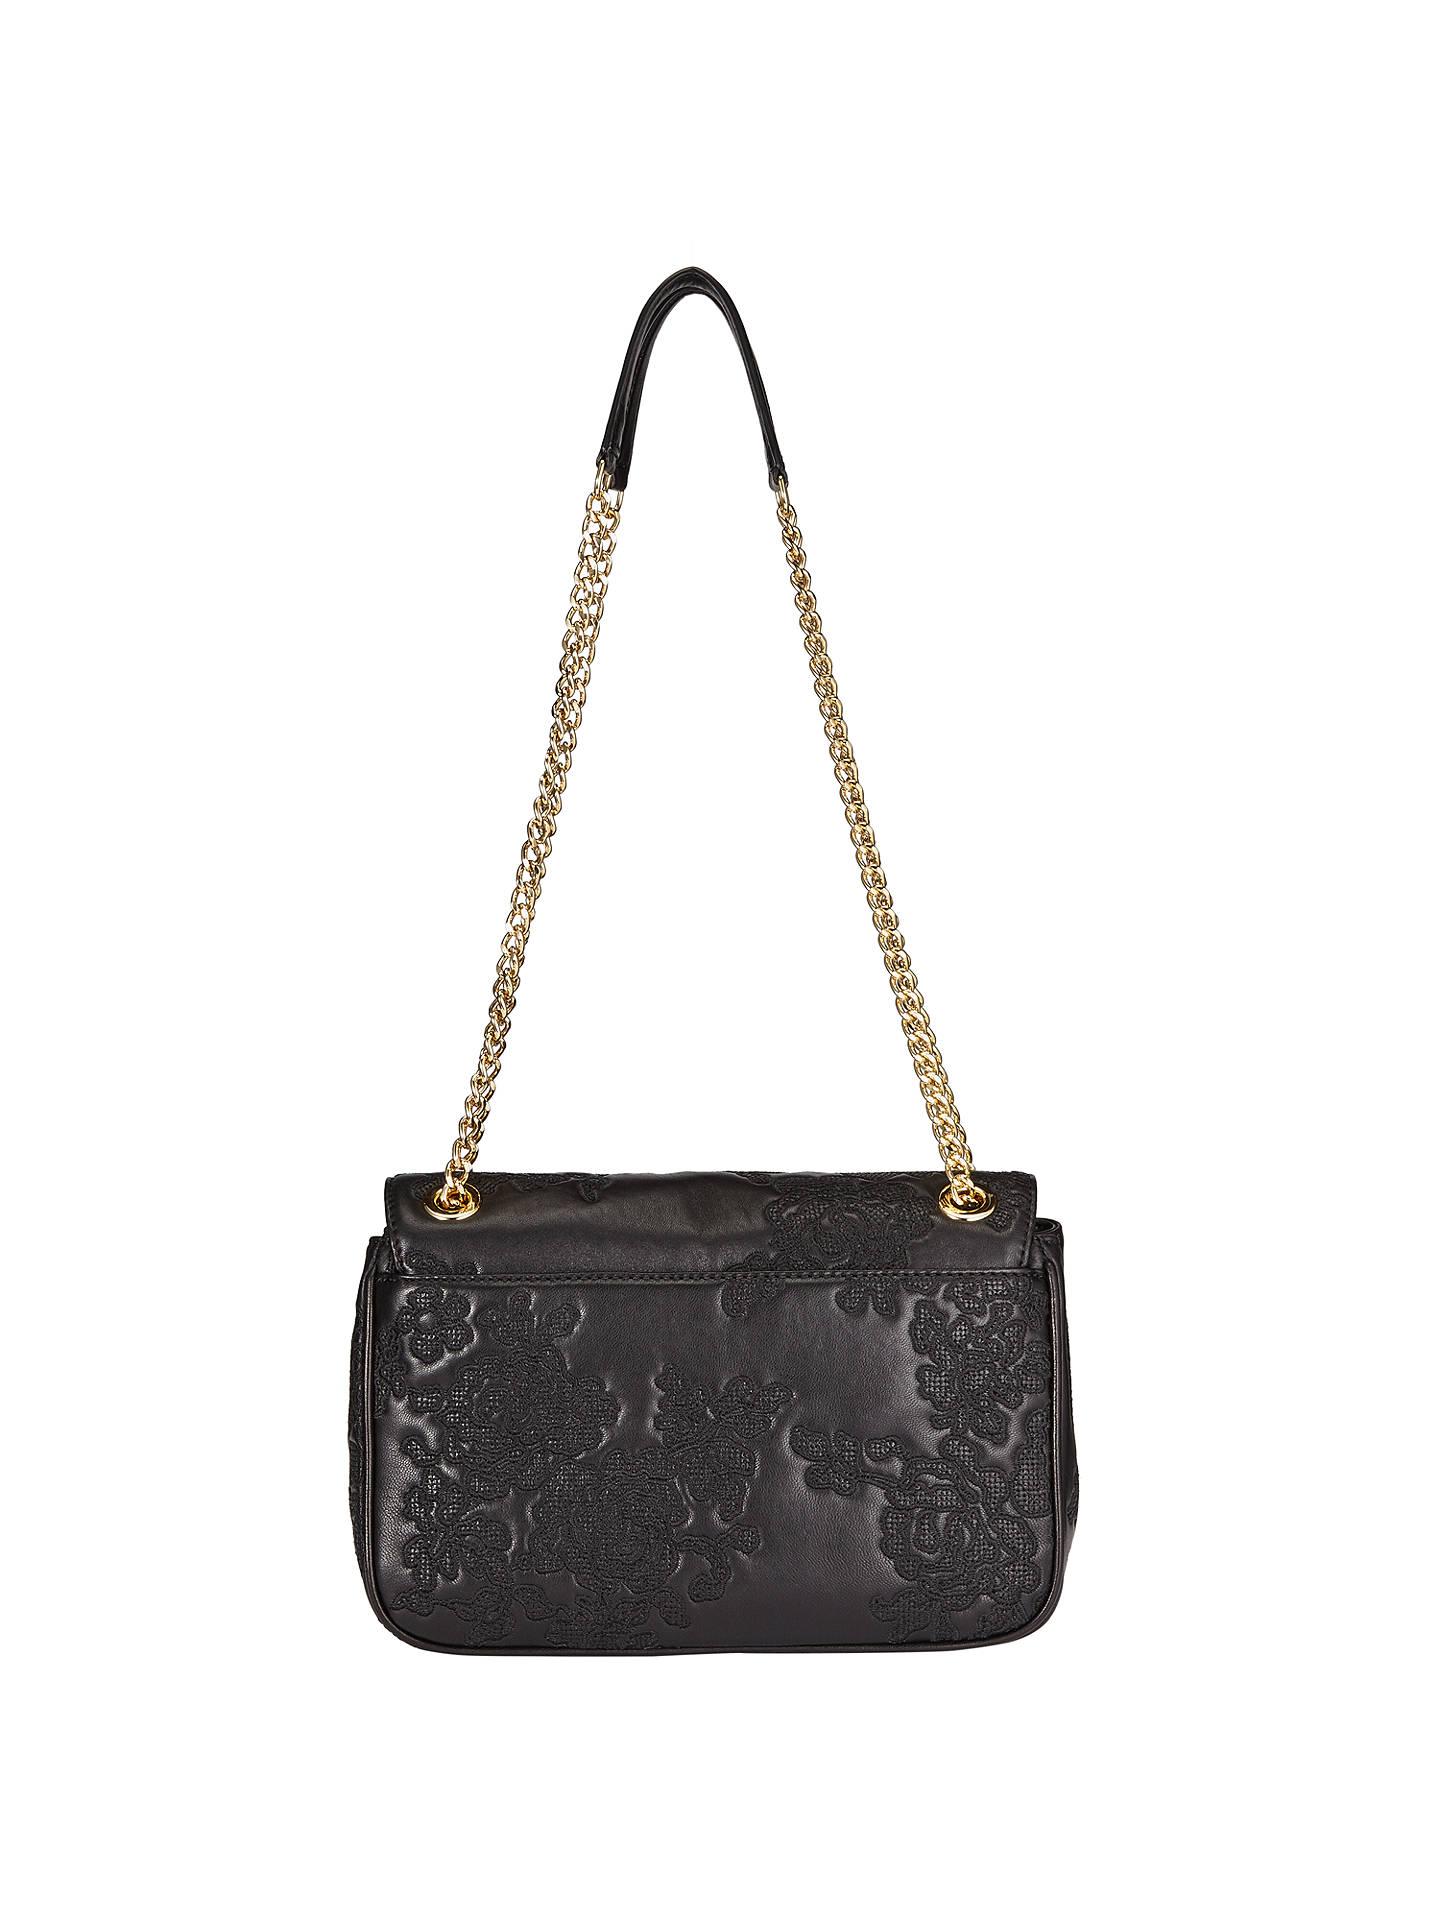 8f37866699b8 ... czech buymichael michael kors lace sloan small leather chain shoulder  bag black online at johnlewis.